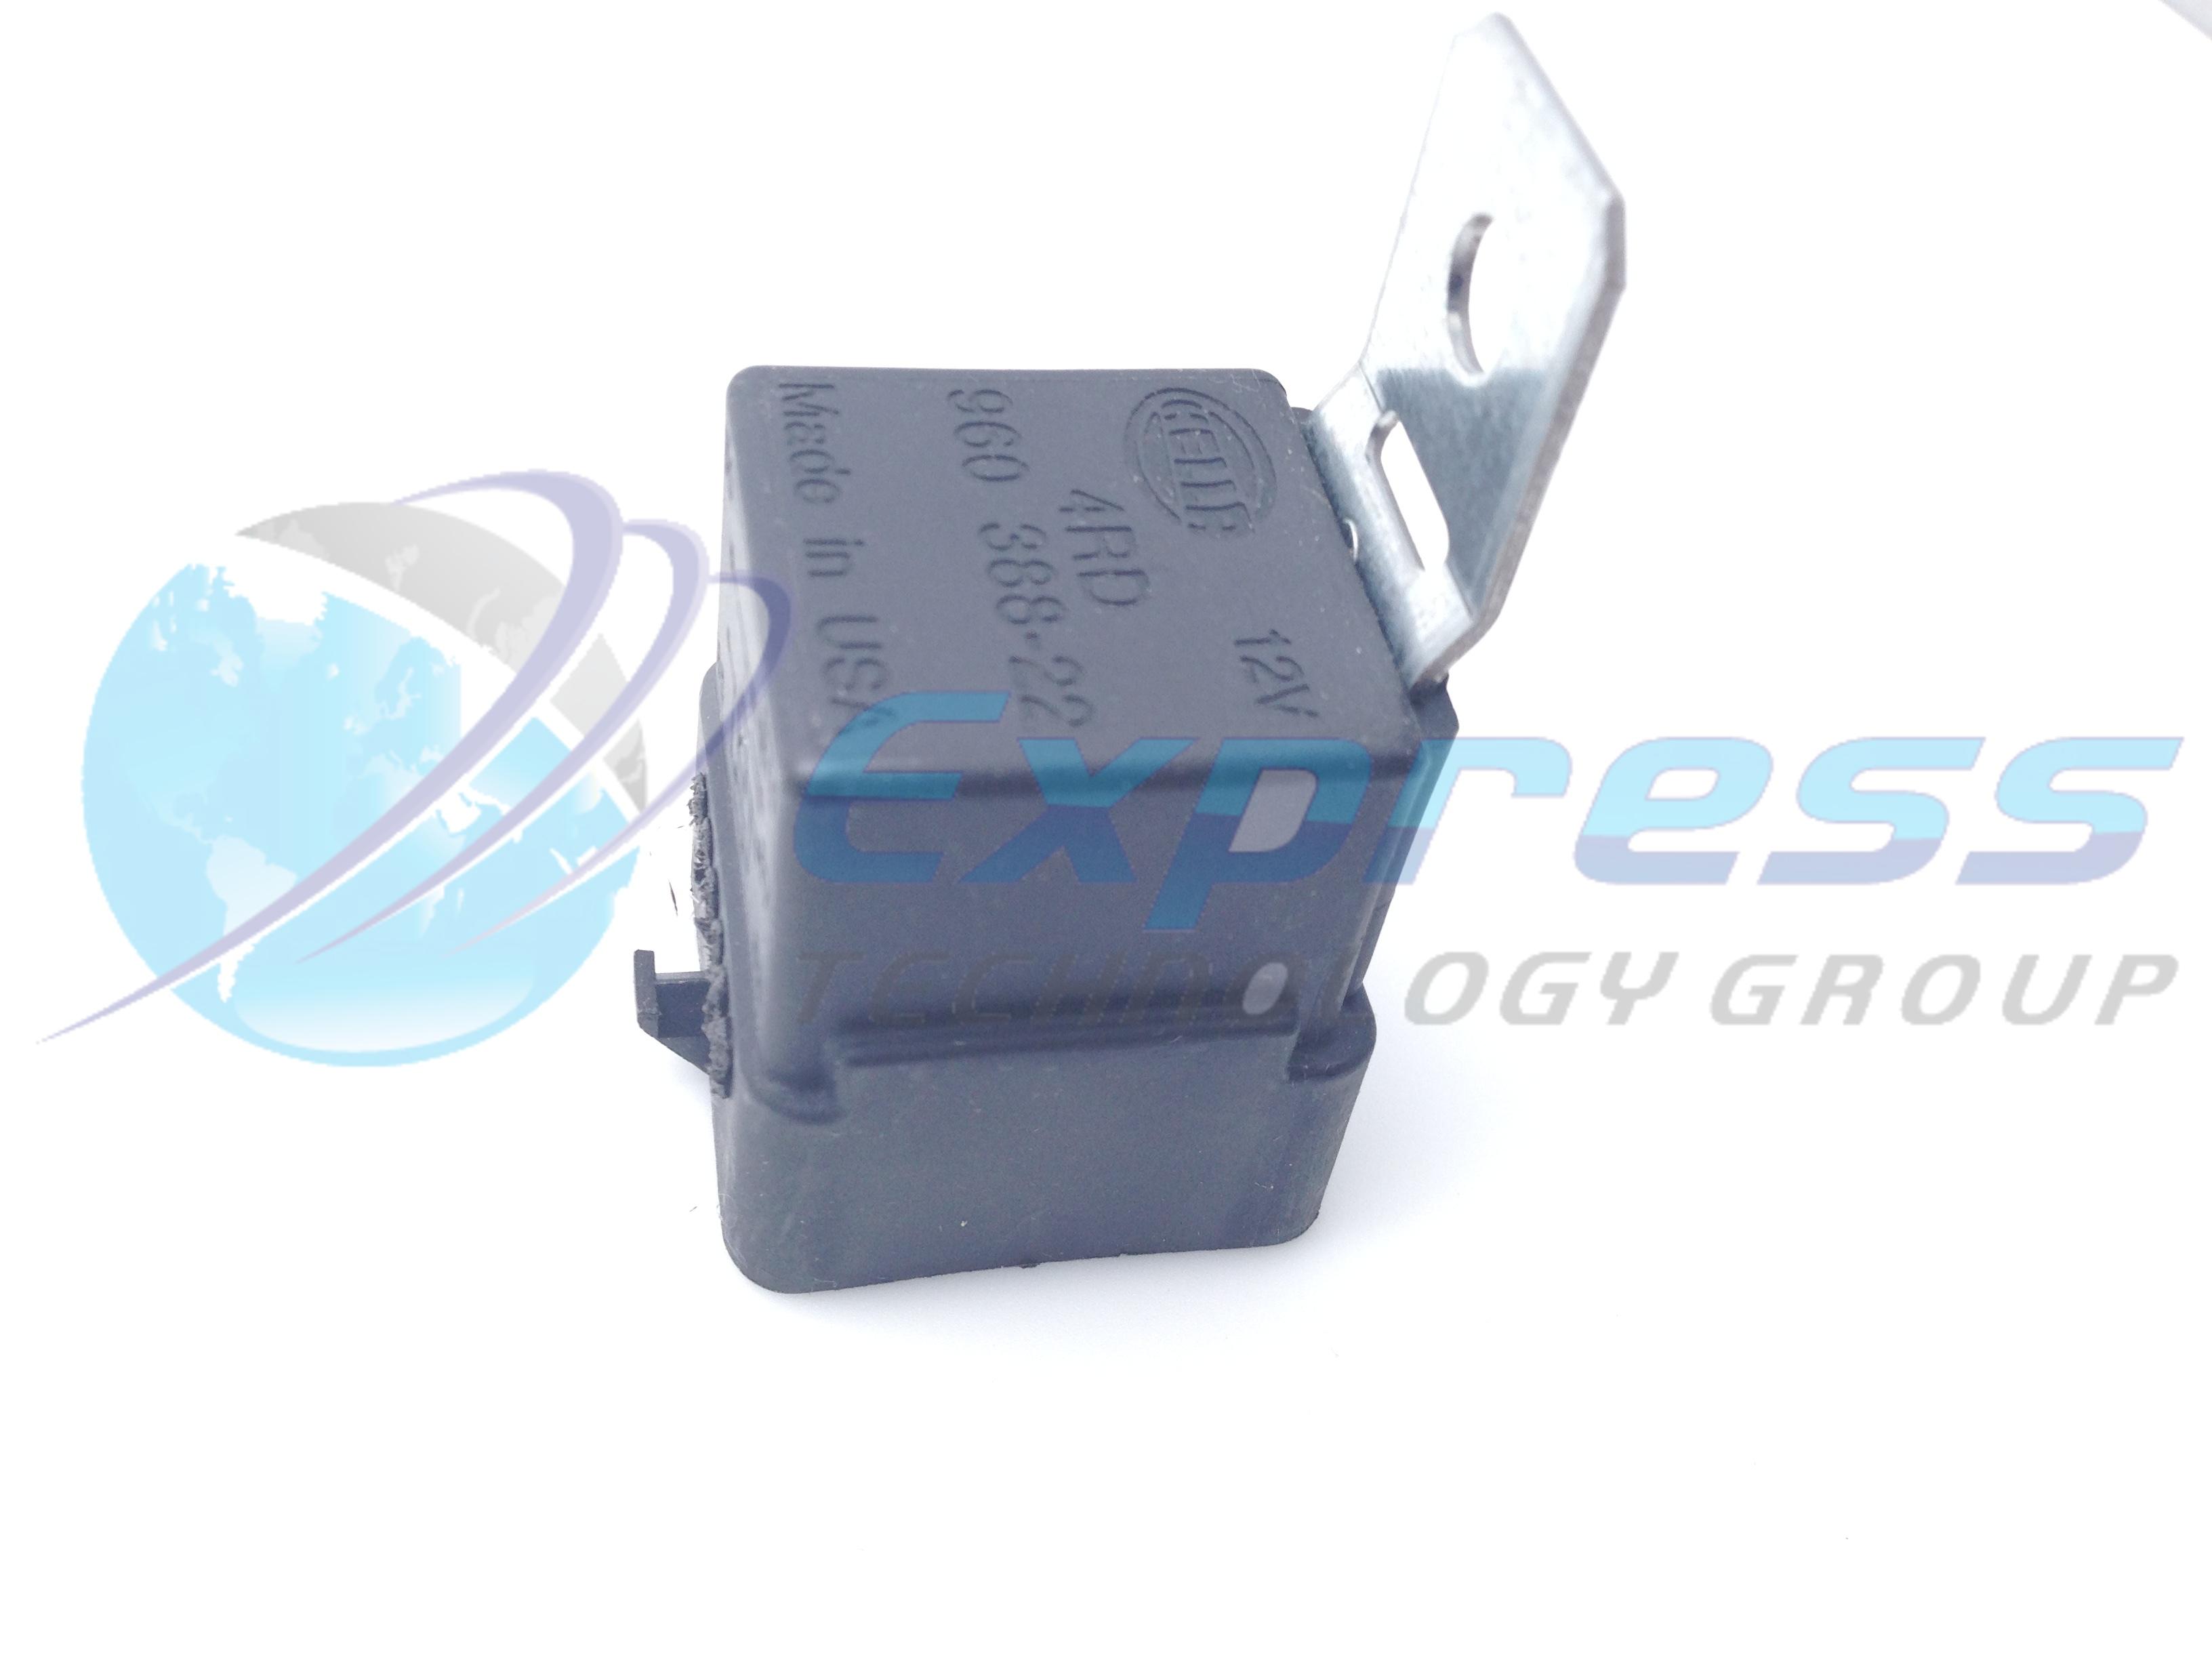 4RD-960388-22 - HELLA - Express Technology Group